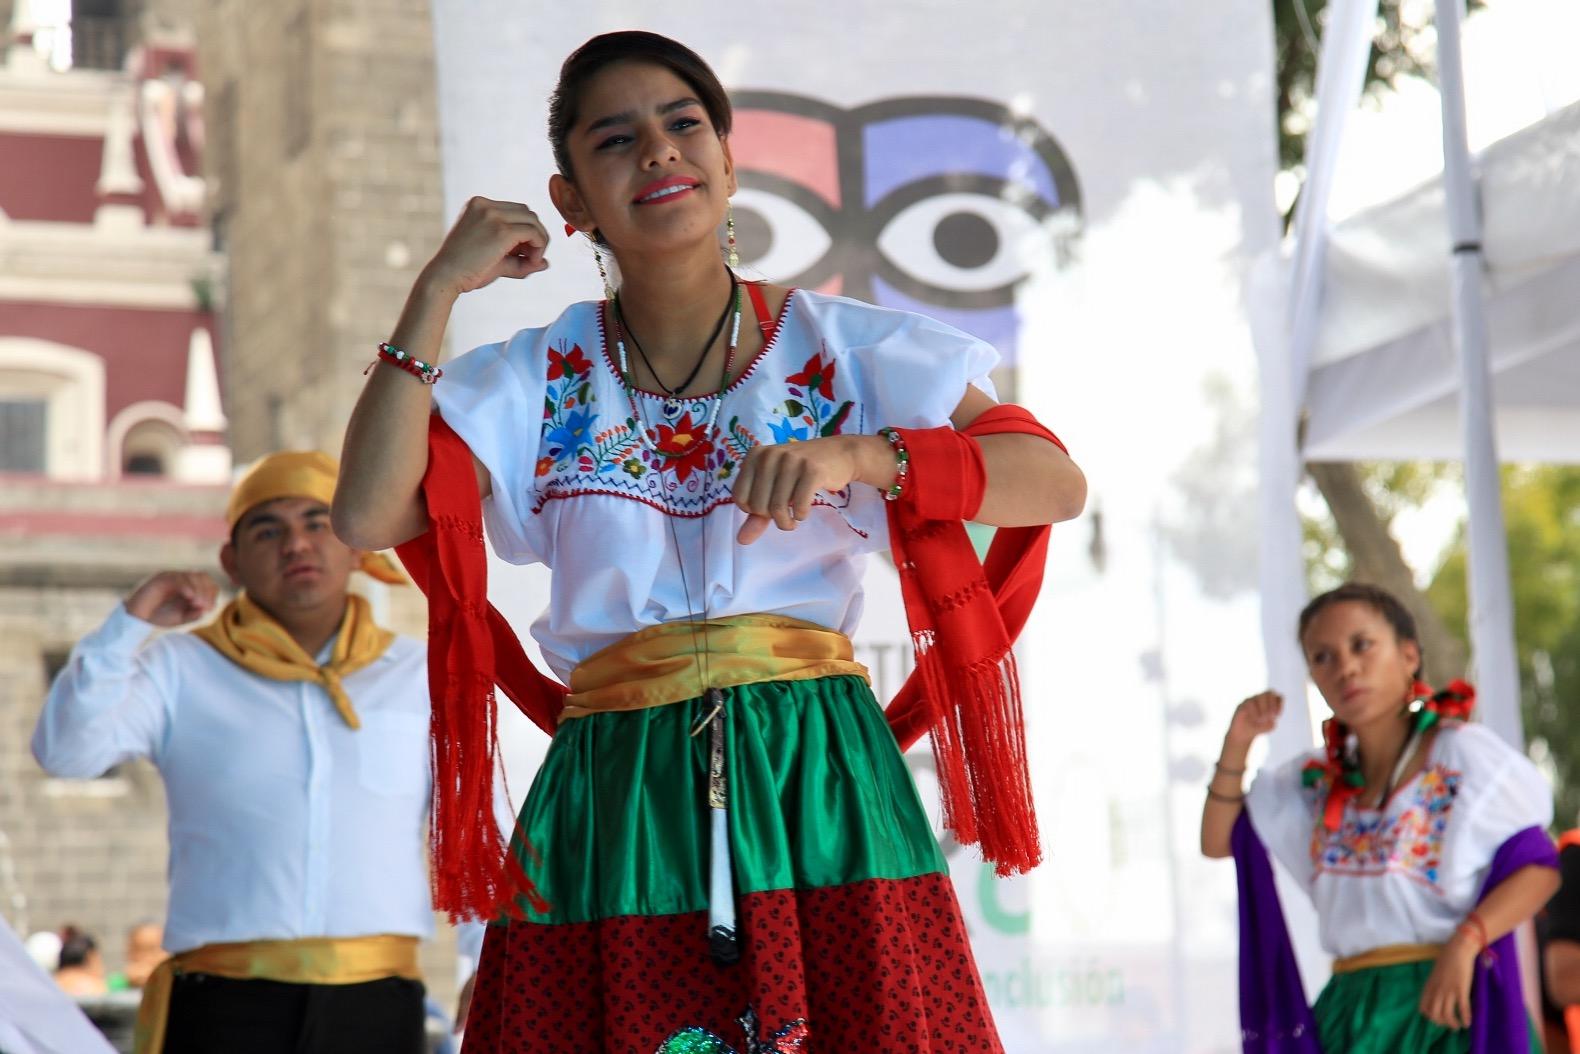 Realizarán el primer concurso de canto en lengua de señas mexicana